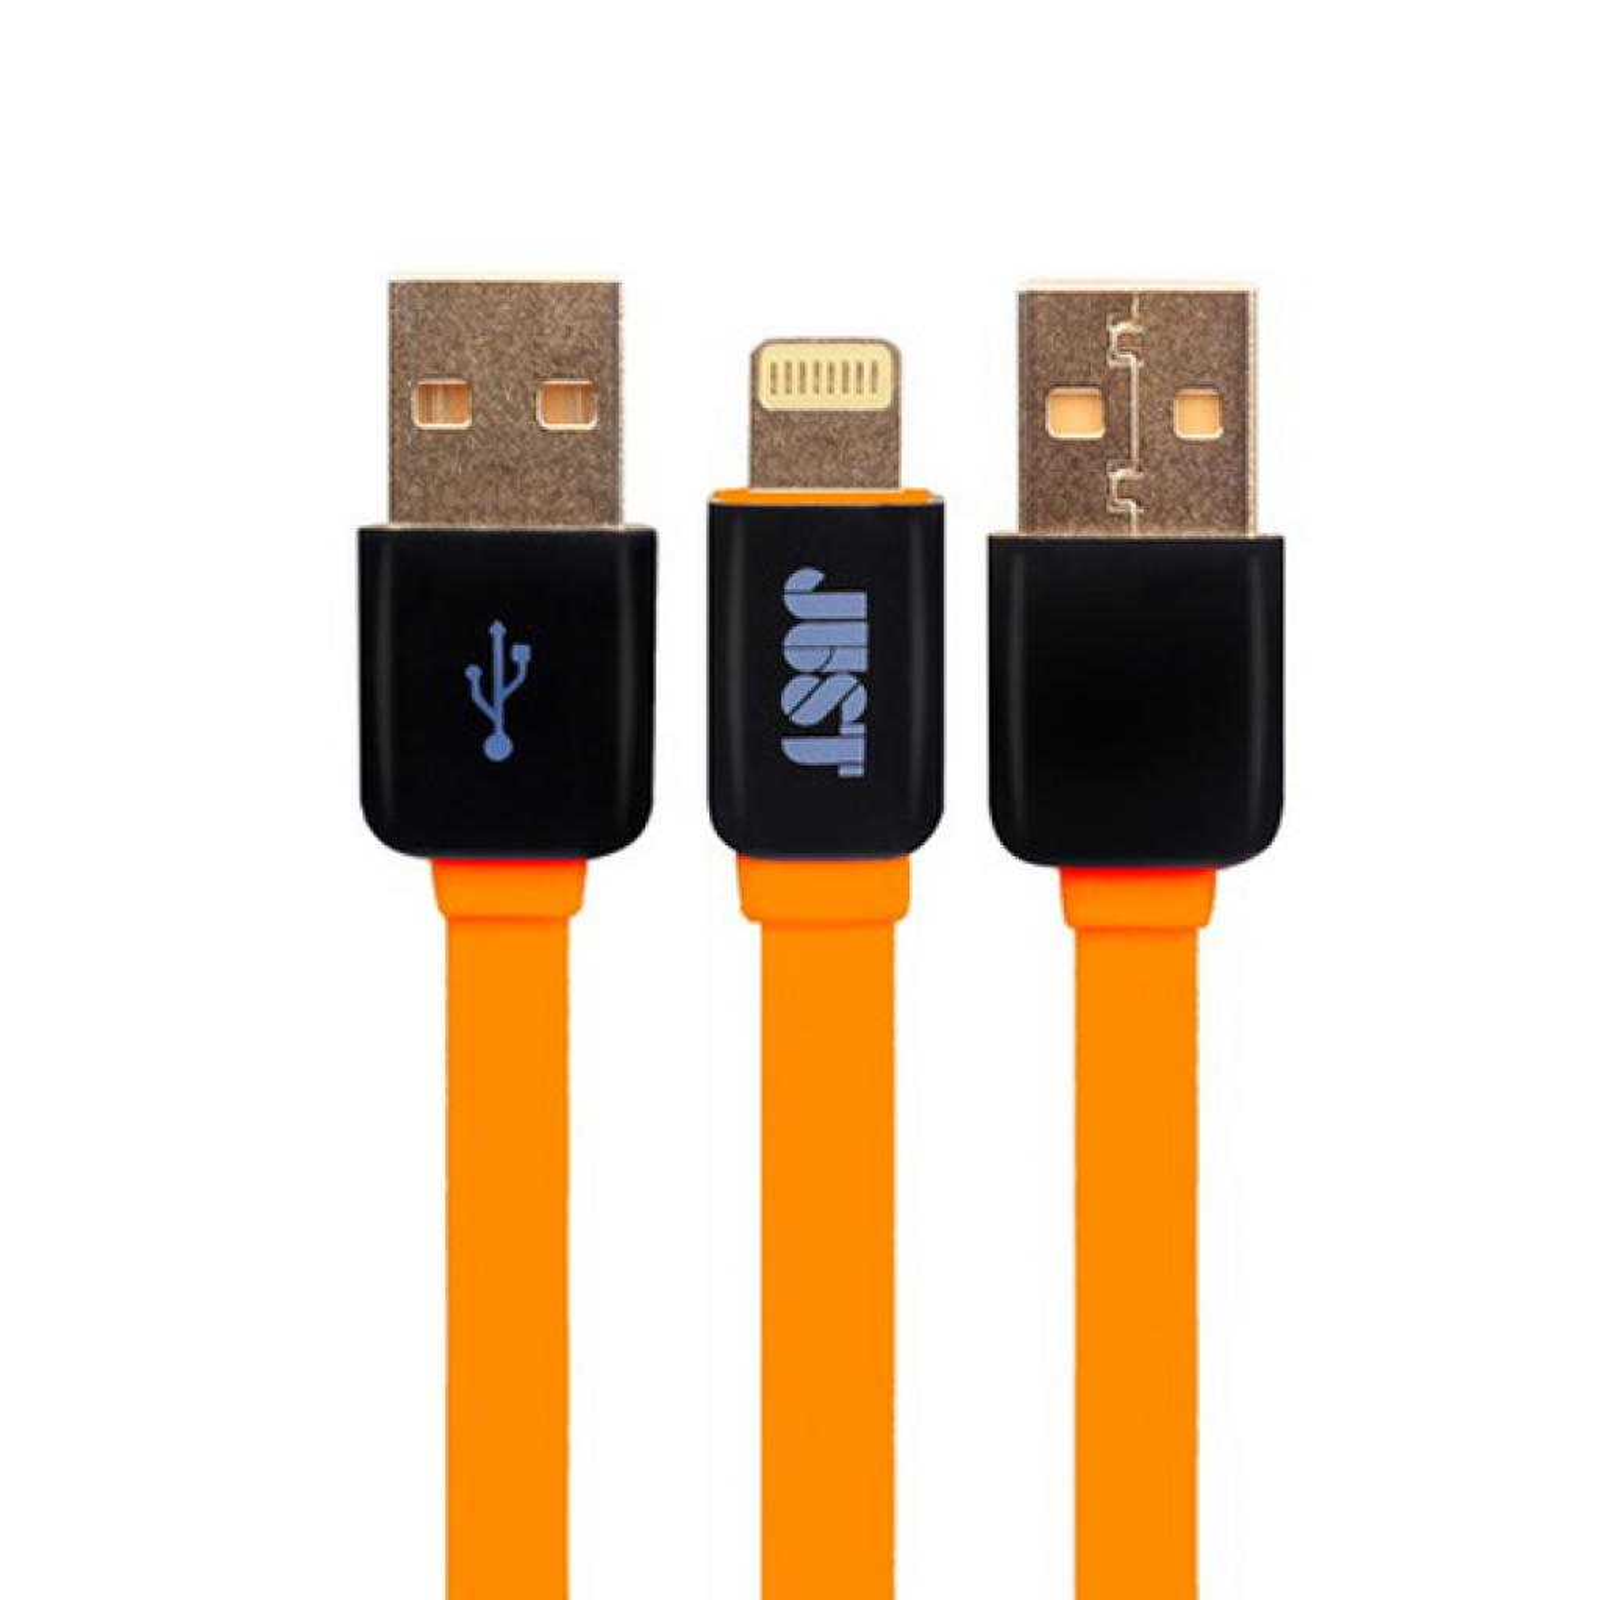 Дата кабель JUST Rainbow Lightning USB Cable Orange (LGTNG-RNBW-RNG)